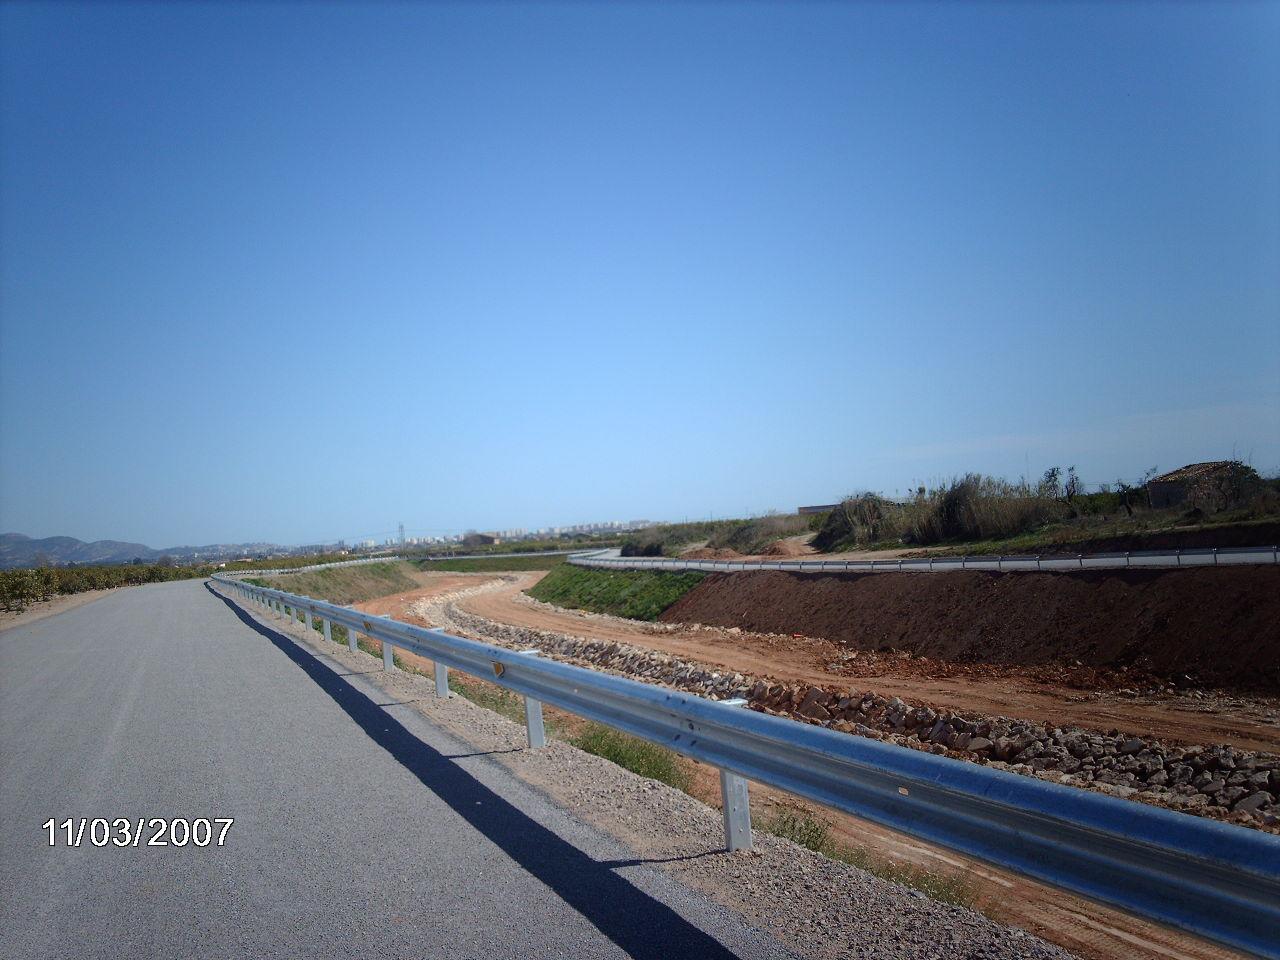 IMAG1592